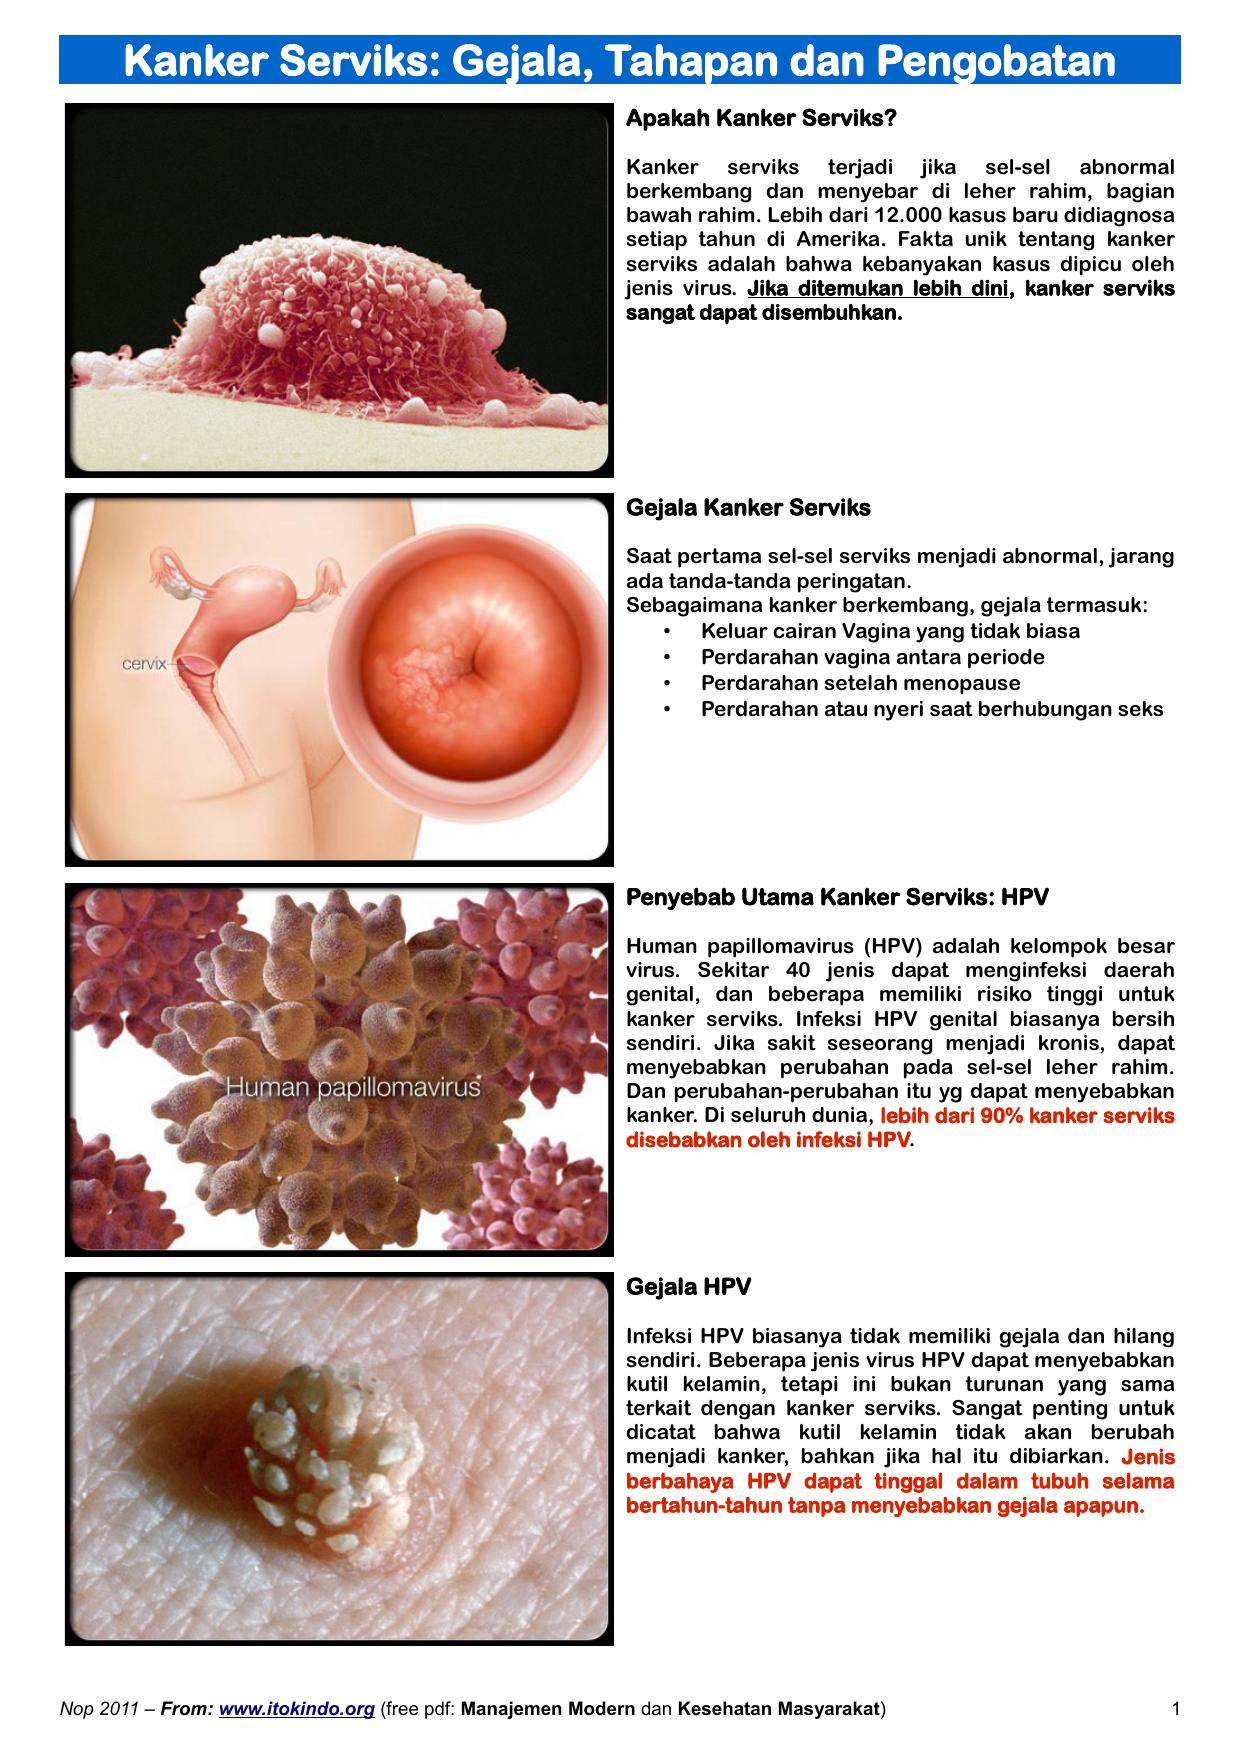 treatment of laryngeal papillomatosis with cidofovir